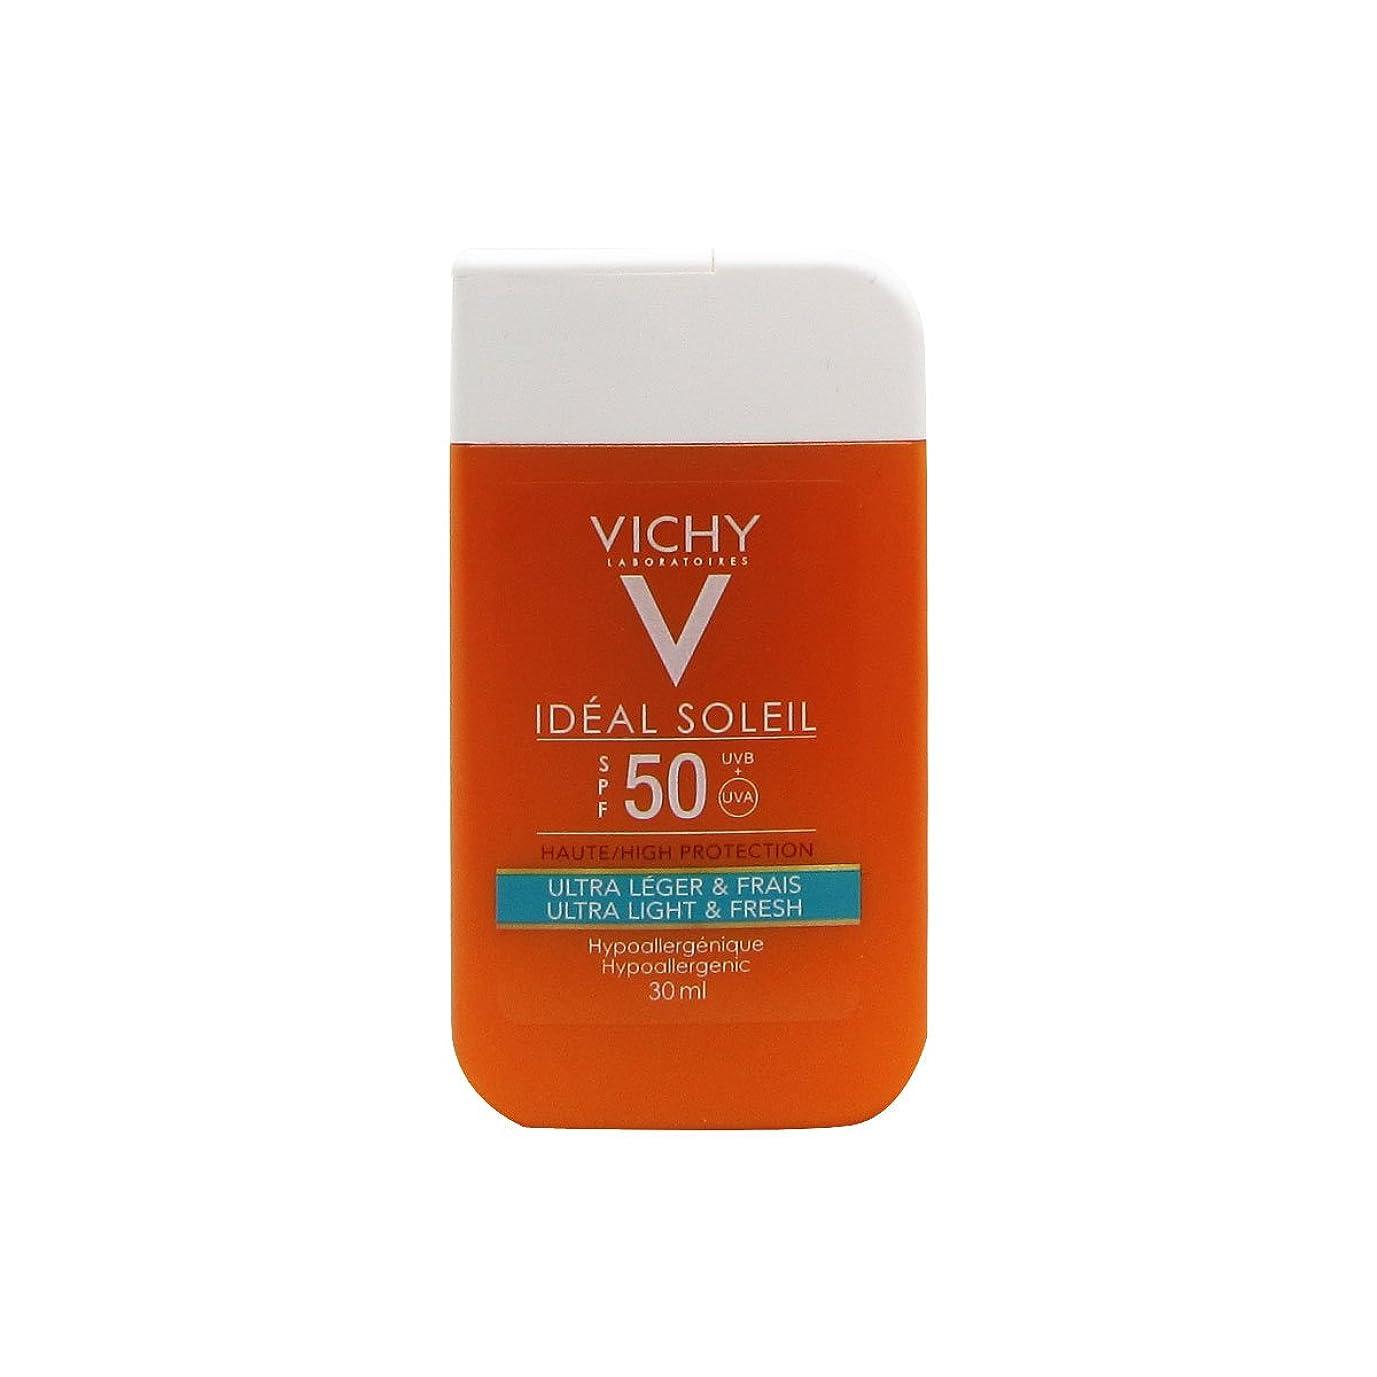 社会科待つ鎮痛剤Vichy Ideal Soleil Mini Pocket Size Ultra Fresh And Light Spf50 30ml [並行輸入品]